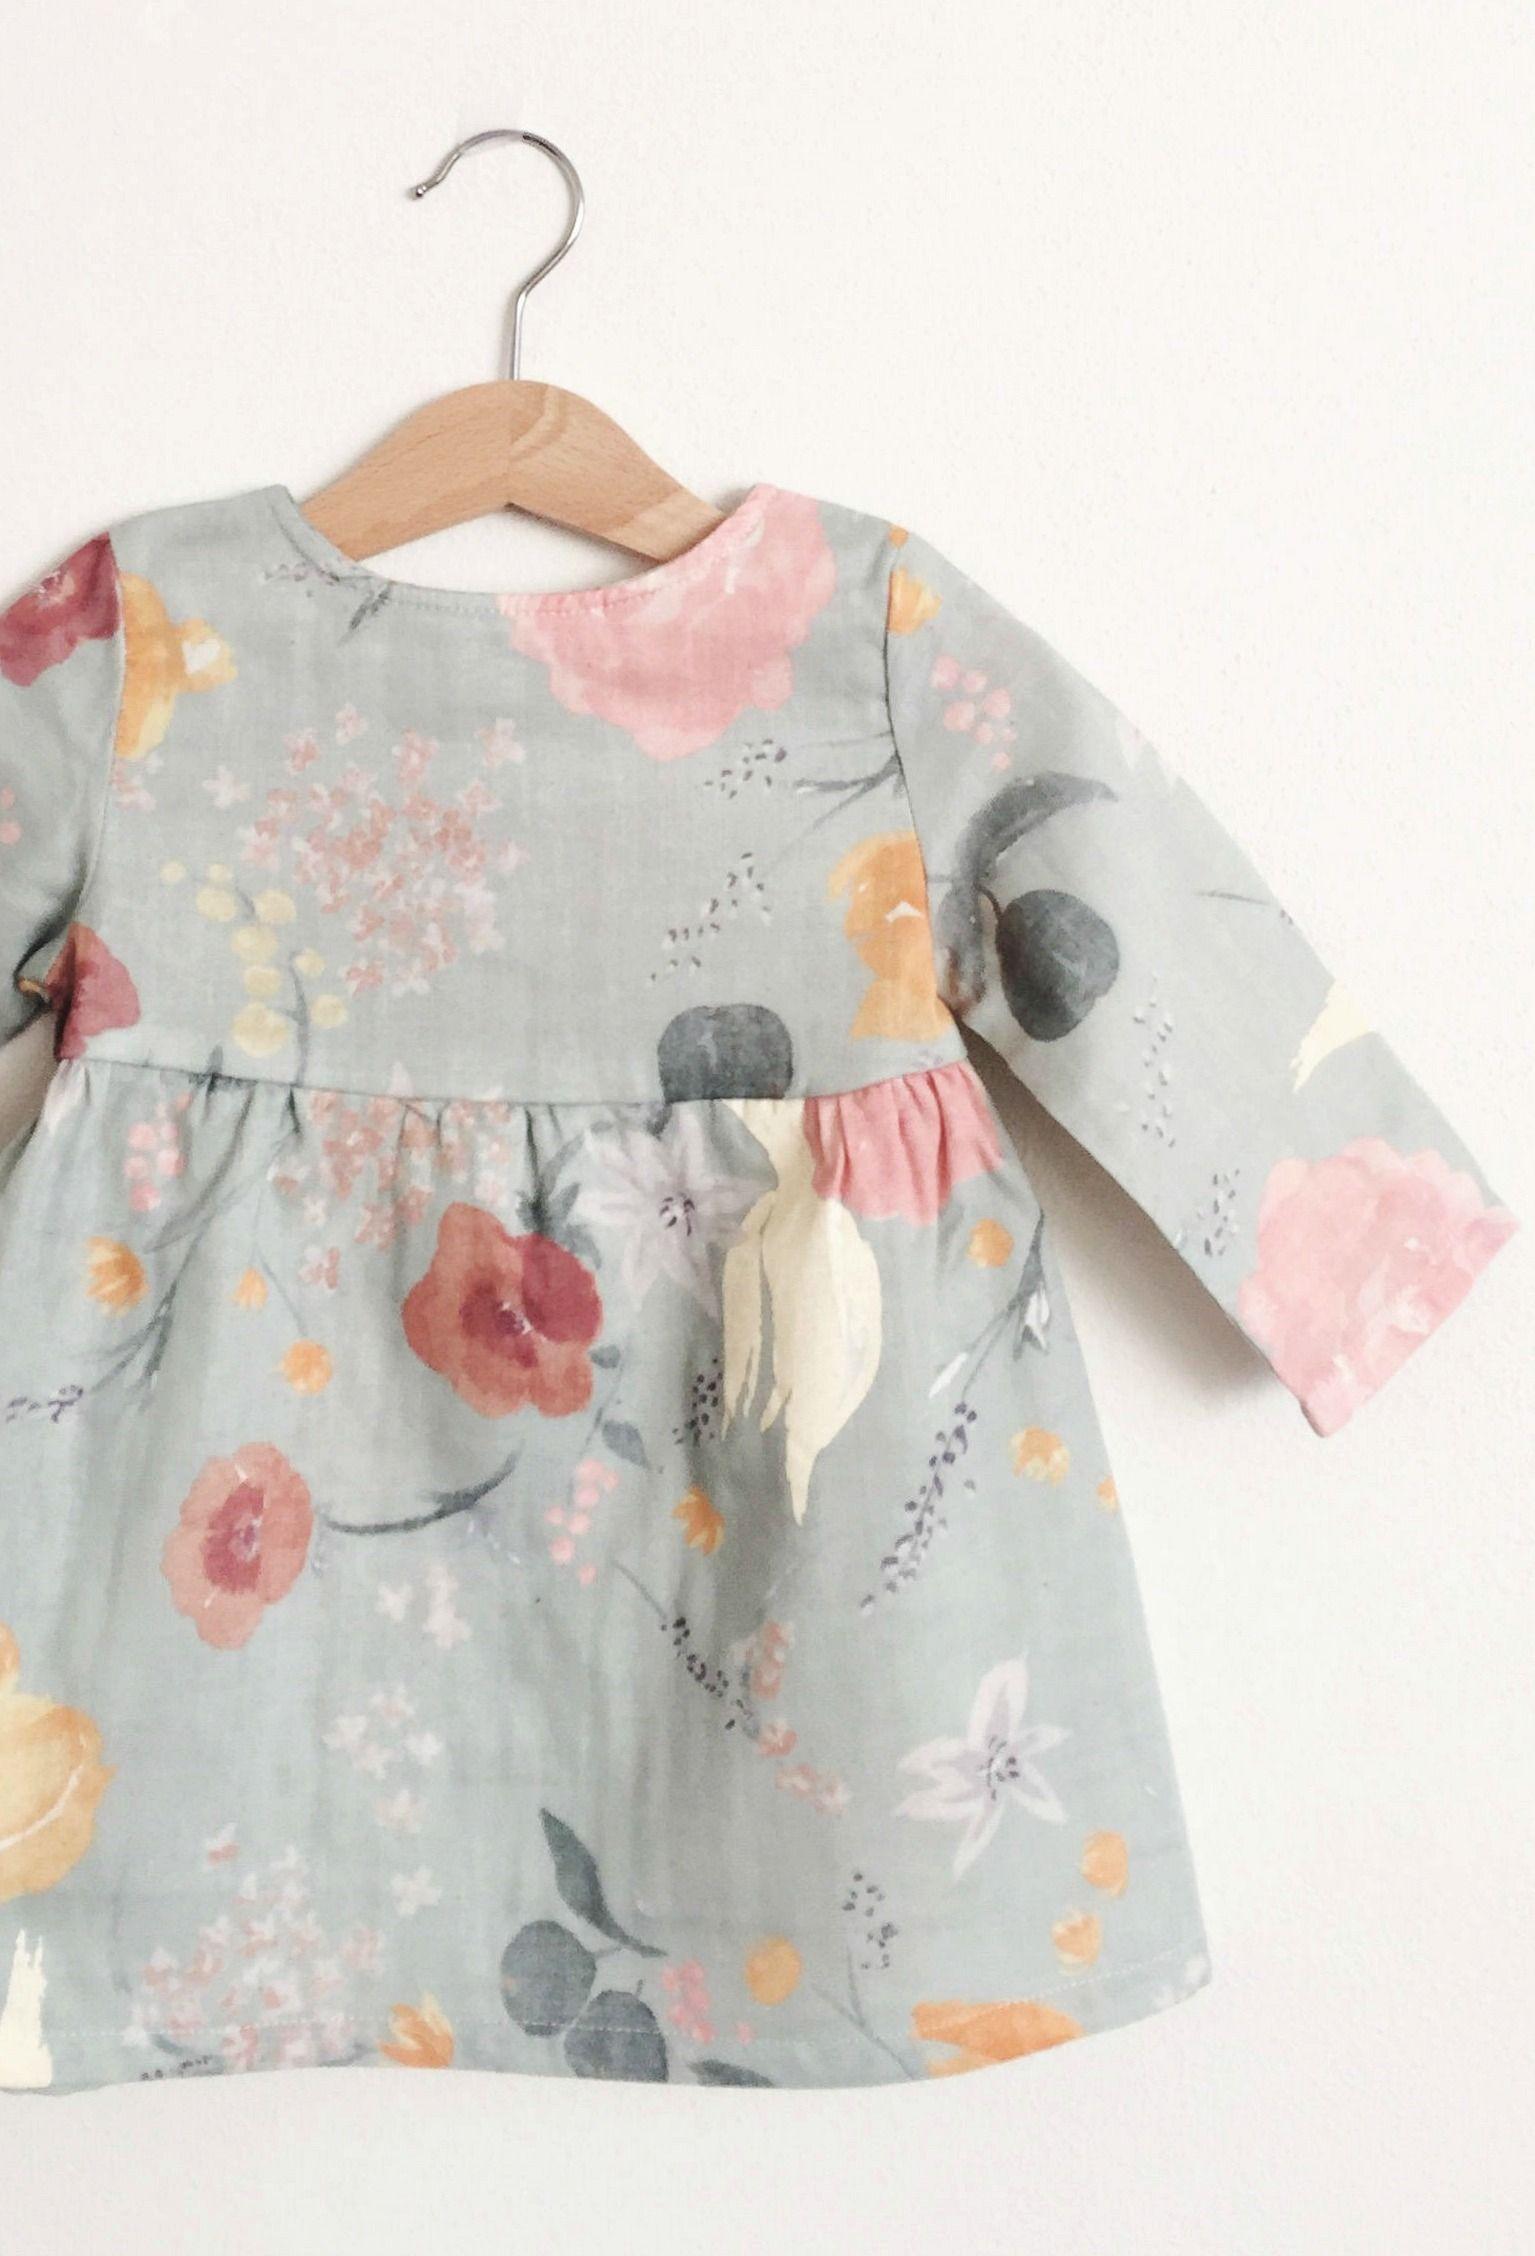 47ee9ba5e39d Little Girls Handmade Vintage Style Floral Dress | HelloTalaria on Etsy